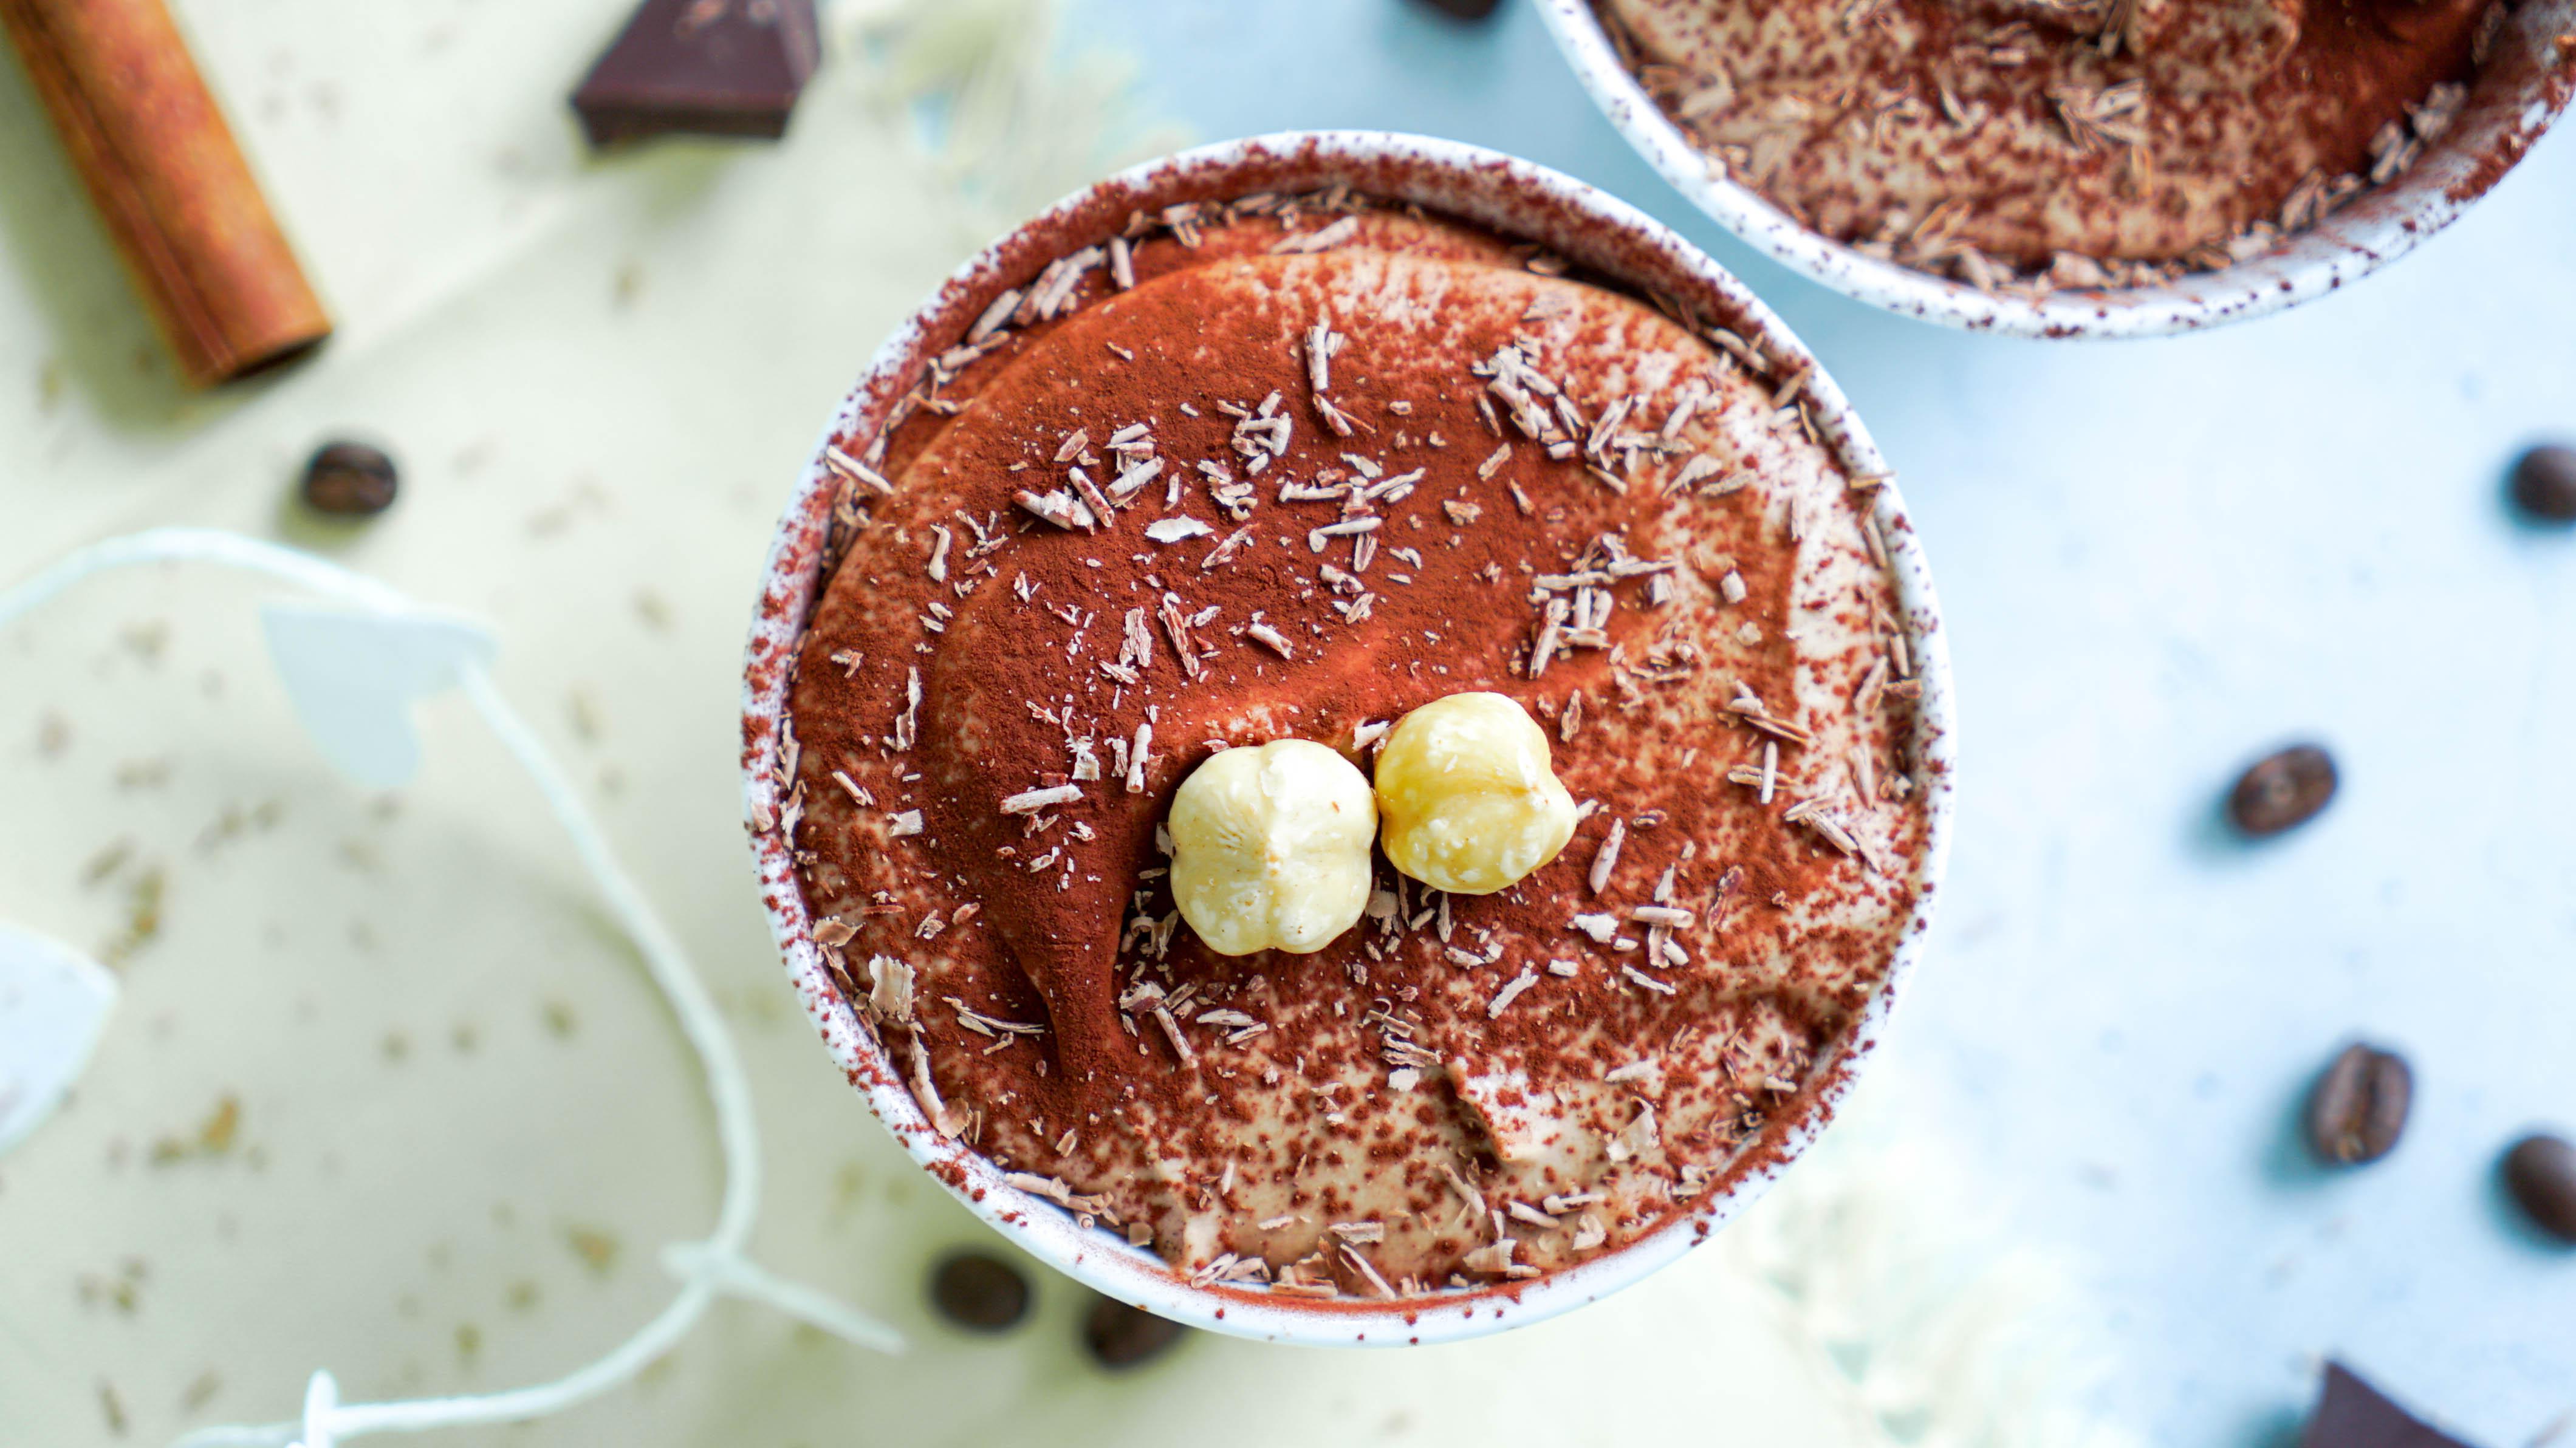 Cremiges Espresso-Schokoladen-Mousse